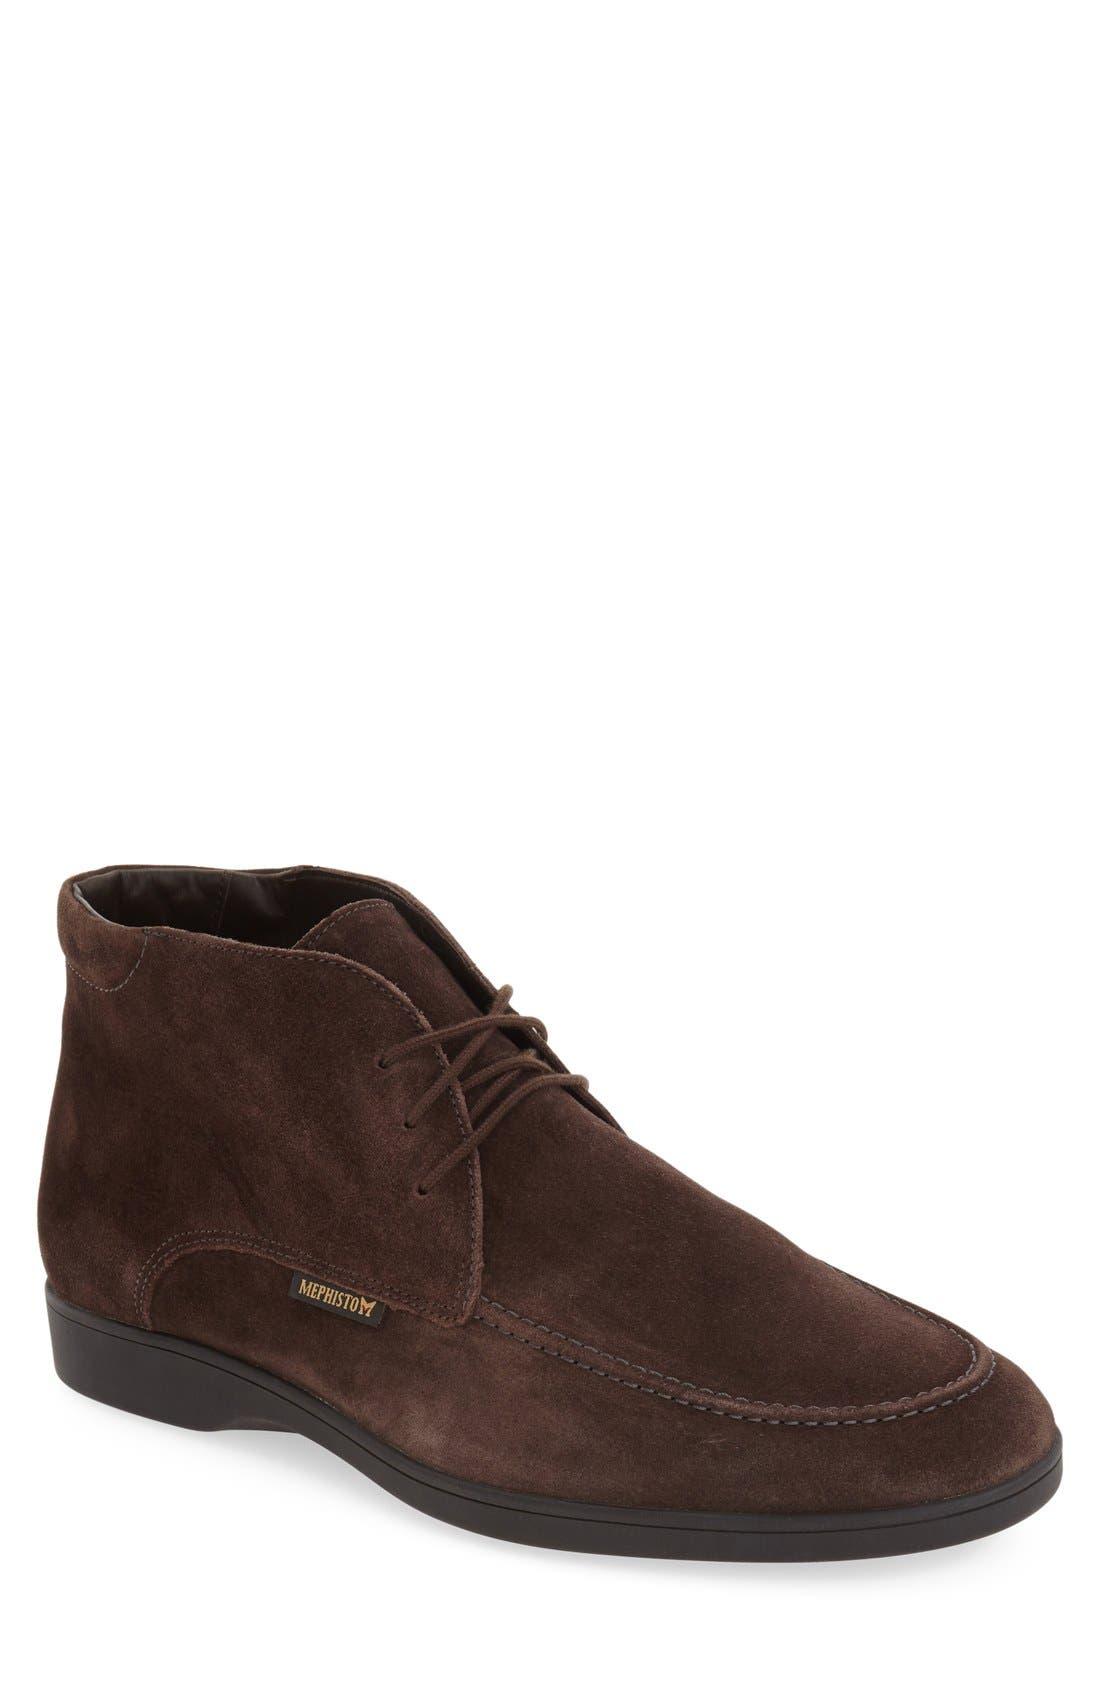 'Stelio' Chukka Boot,                         Main,                         color, Dark Brown Suede